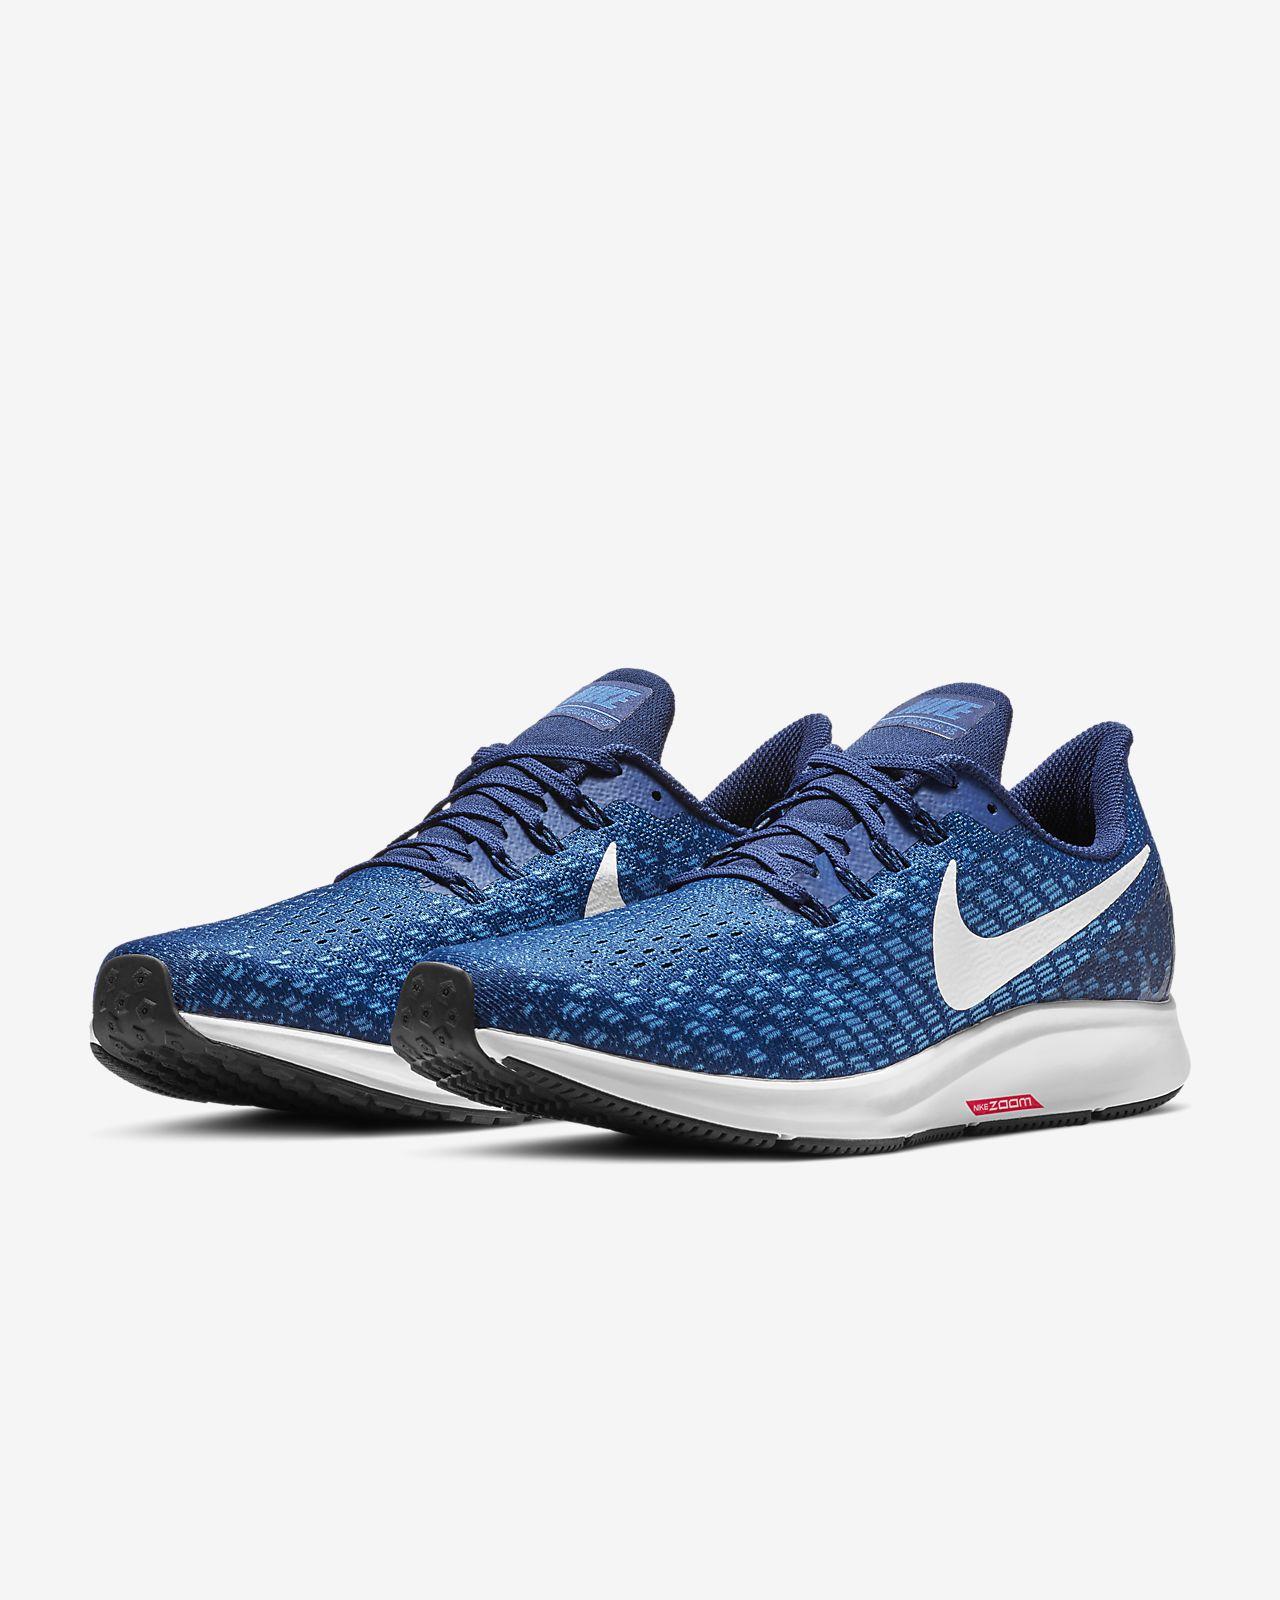 dc548498a3e30 Nike Air Zoom Pegasus 35 Zapatillas de running - Hombre. Nike.com ES